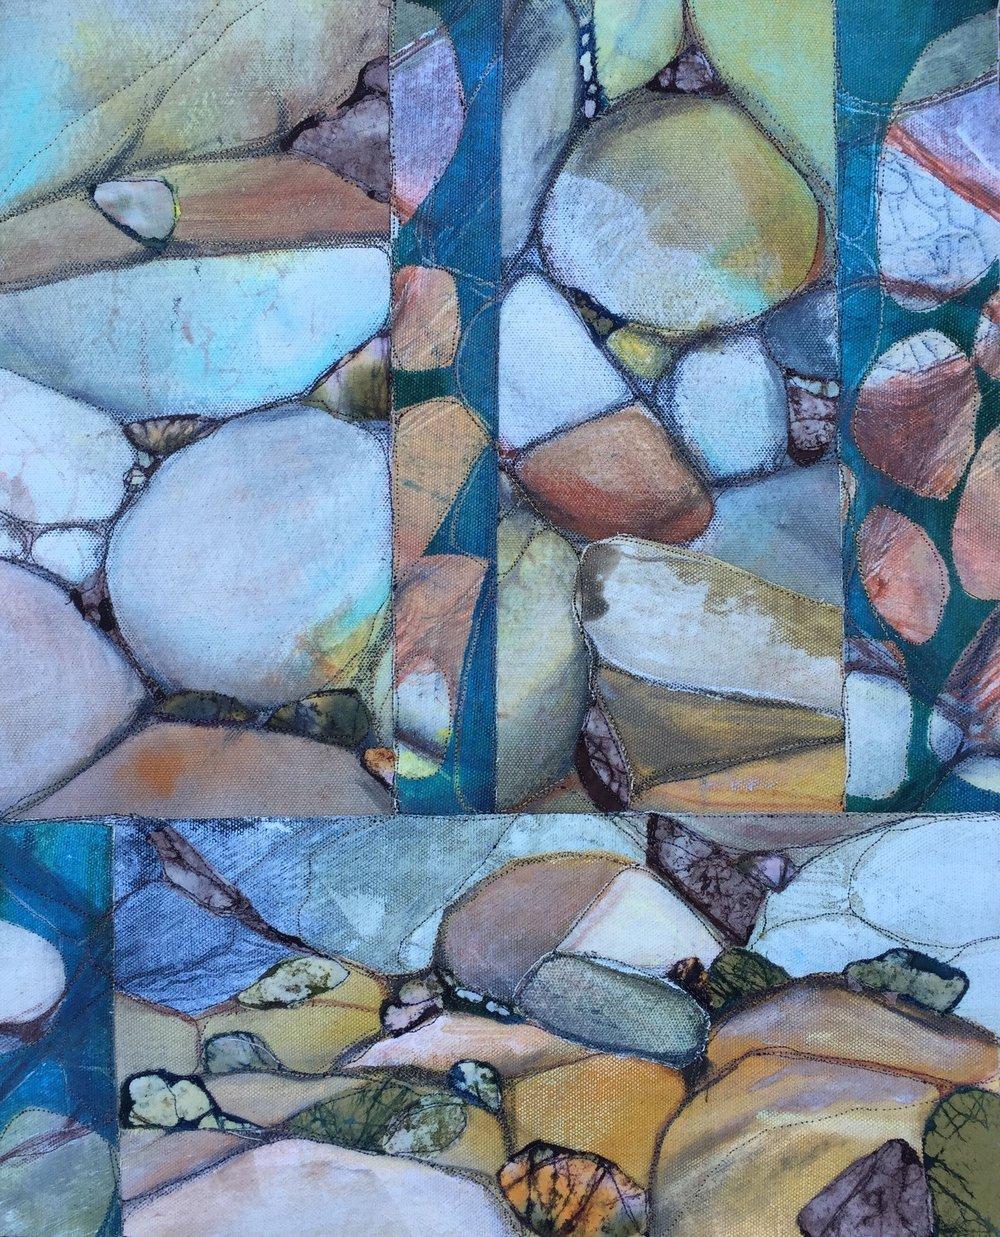 Russet Rocks